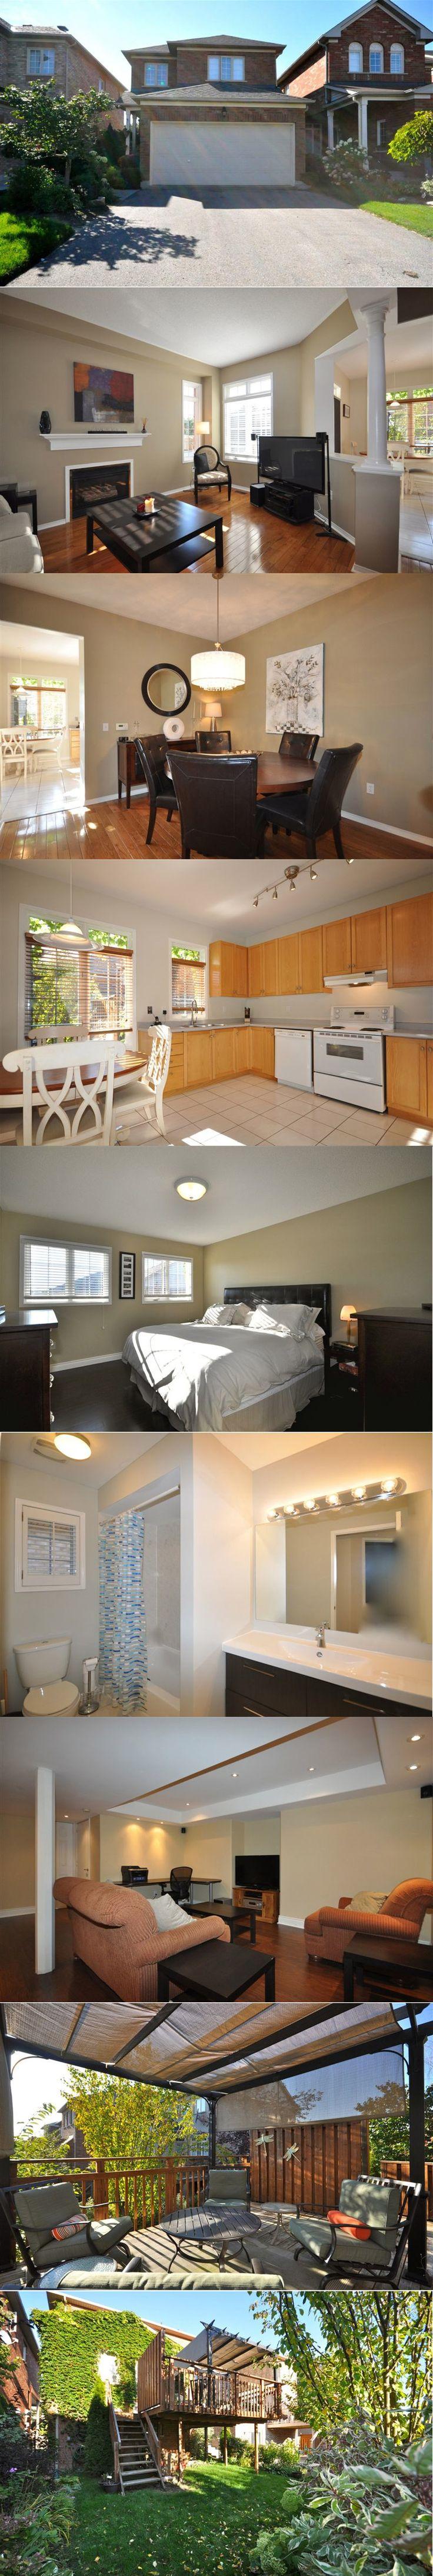 Sold For $489,000 24 Trent St. Aurora, Ontario Building Type : Detached Bedrooms : 3+1 Bathrooms : 3 Aurora Real Estate 98% Of List